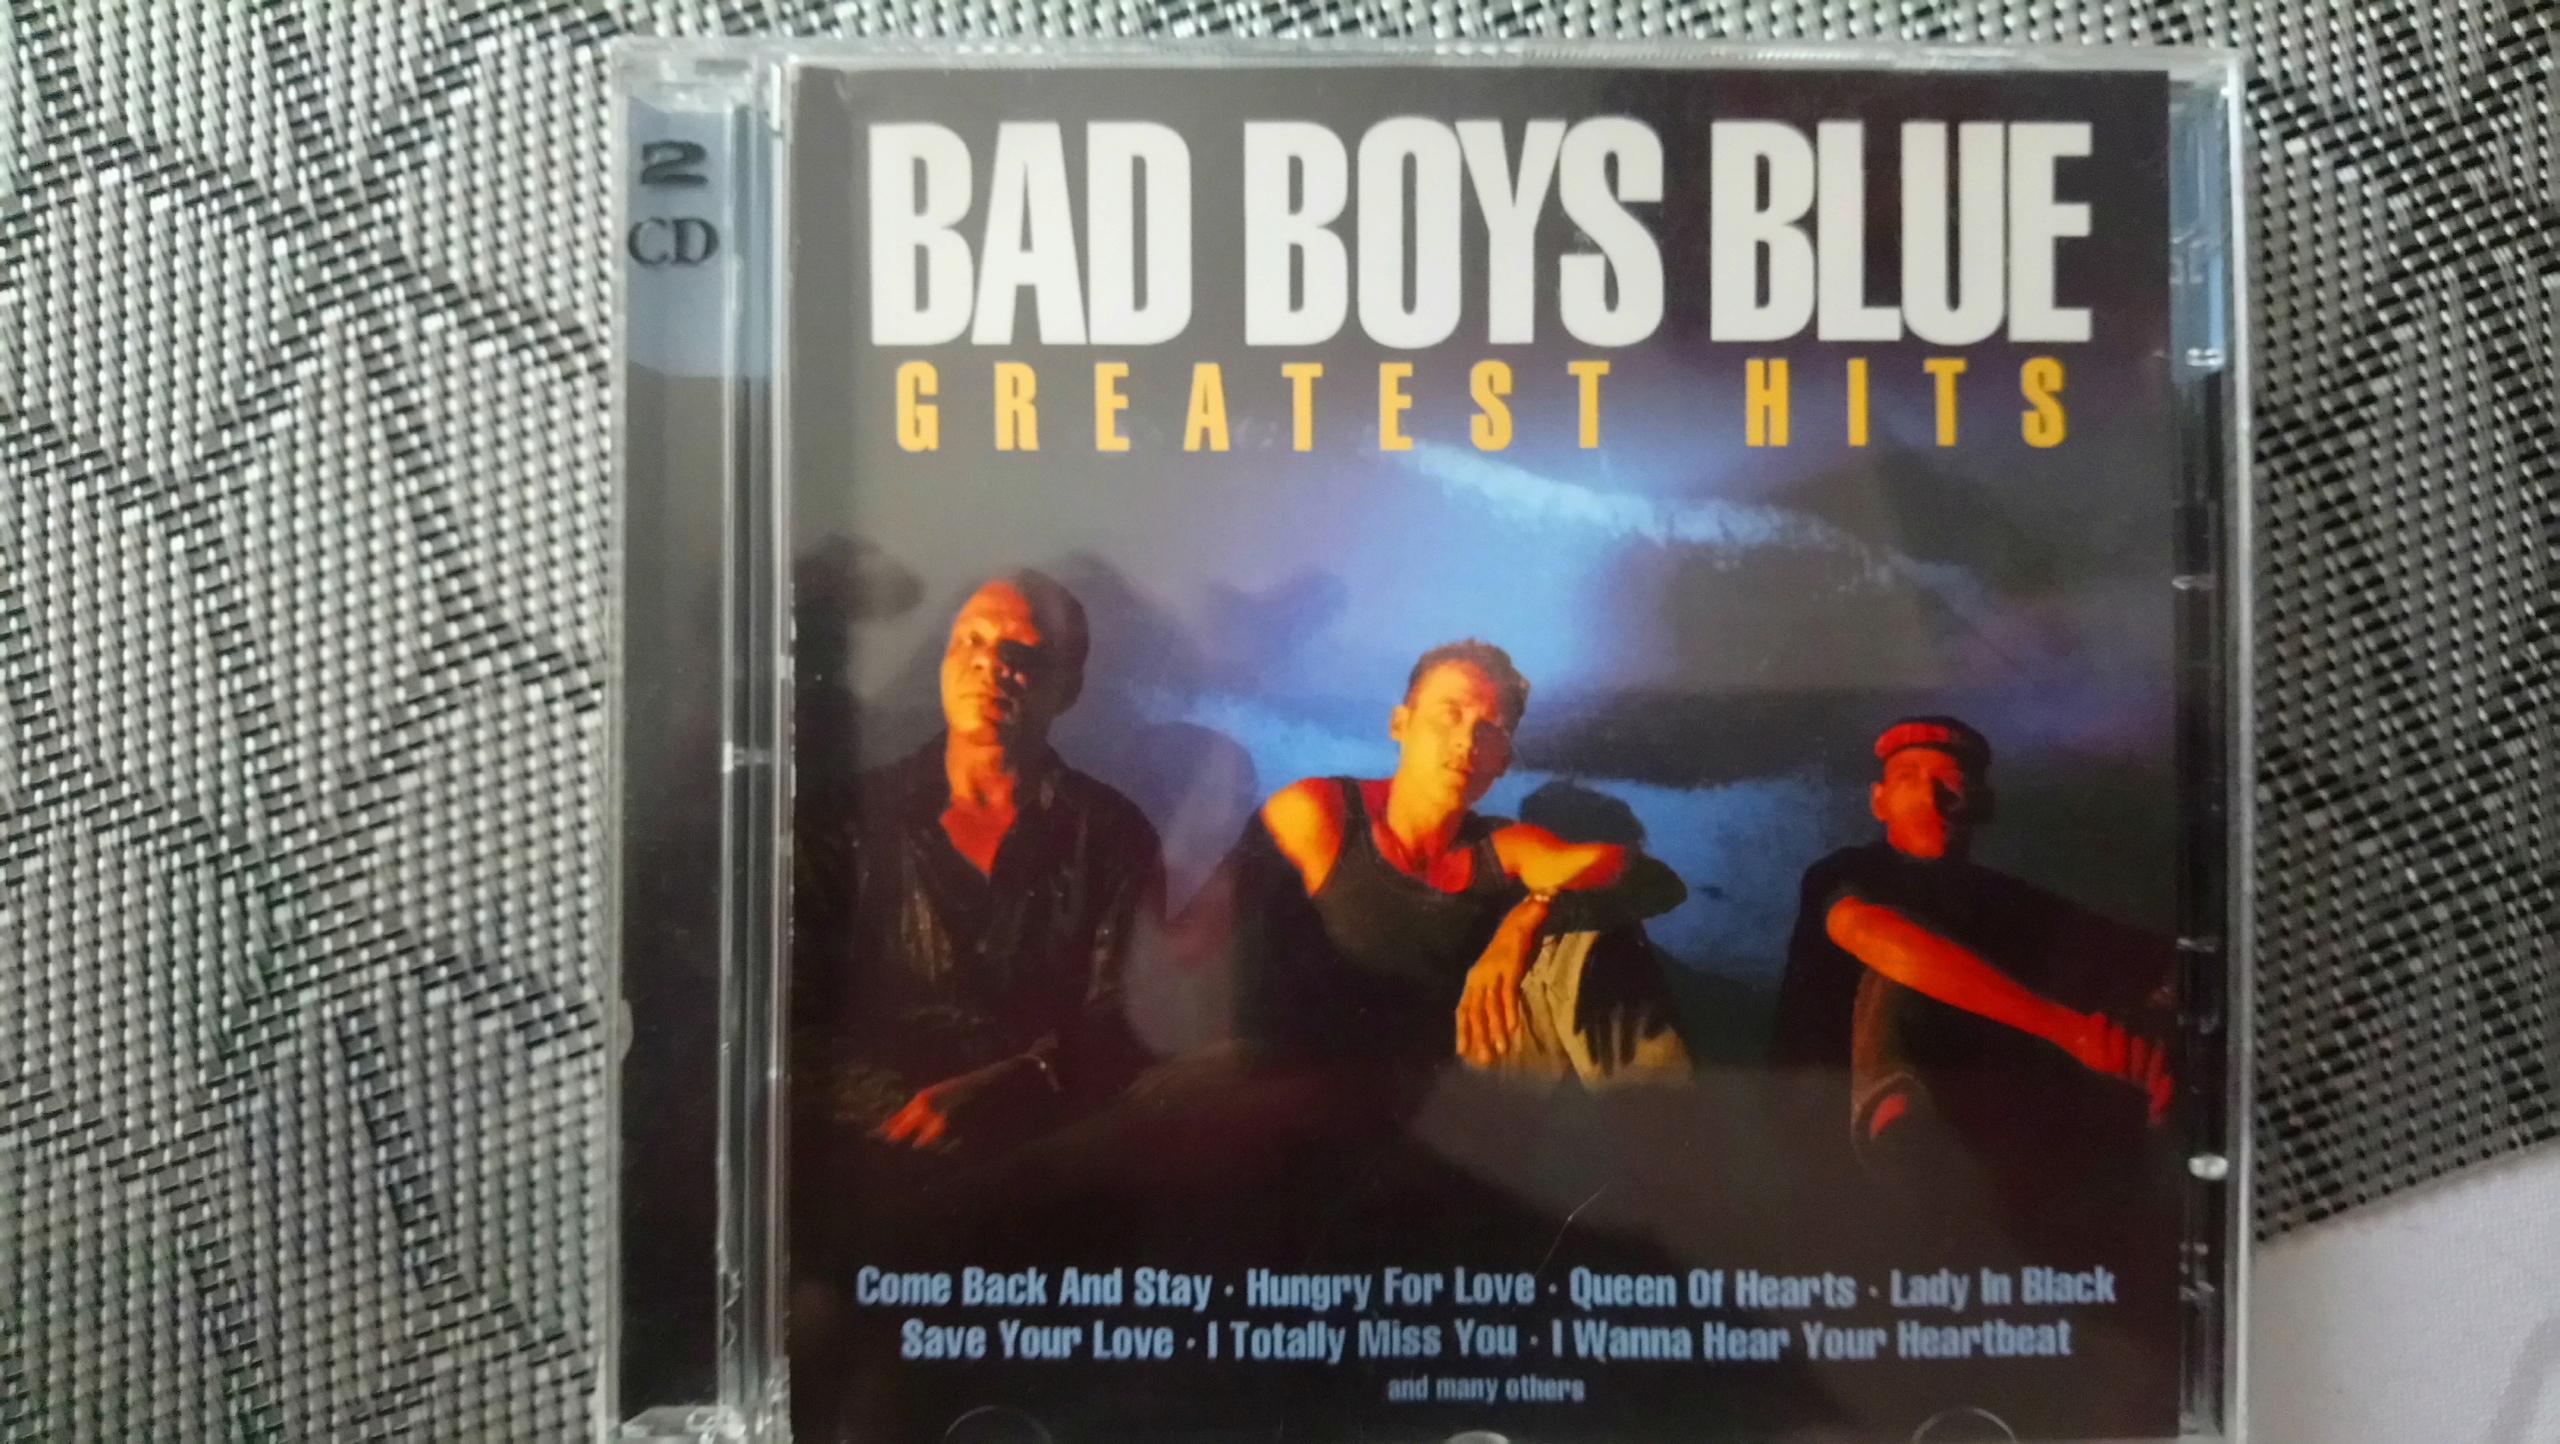 Bad Boys Blue Gratest Hits 2CD